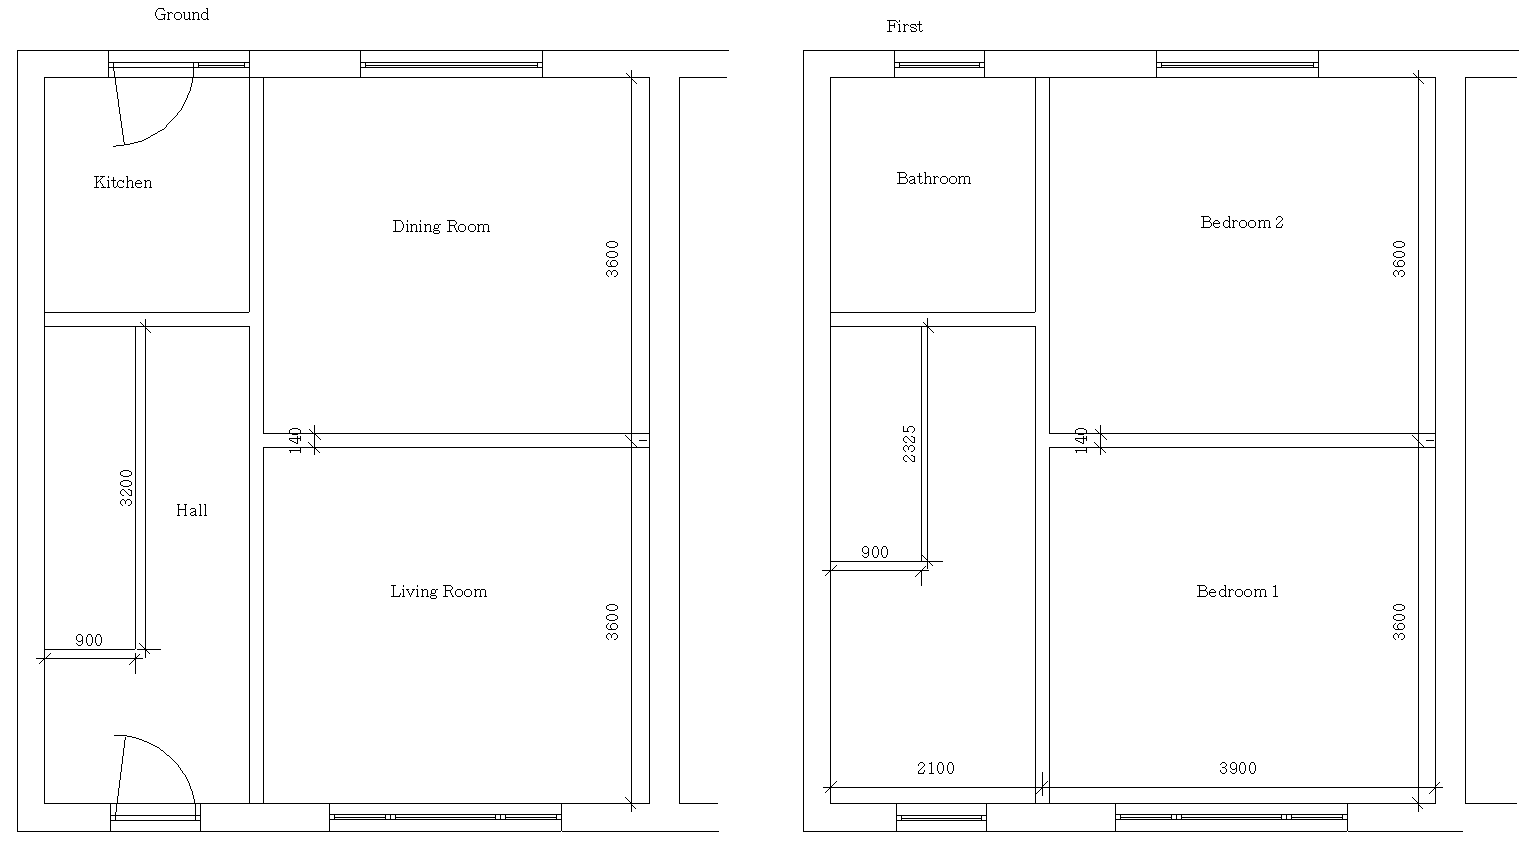 Semi-detached house floor plan